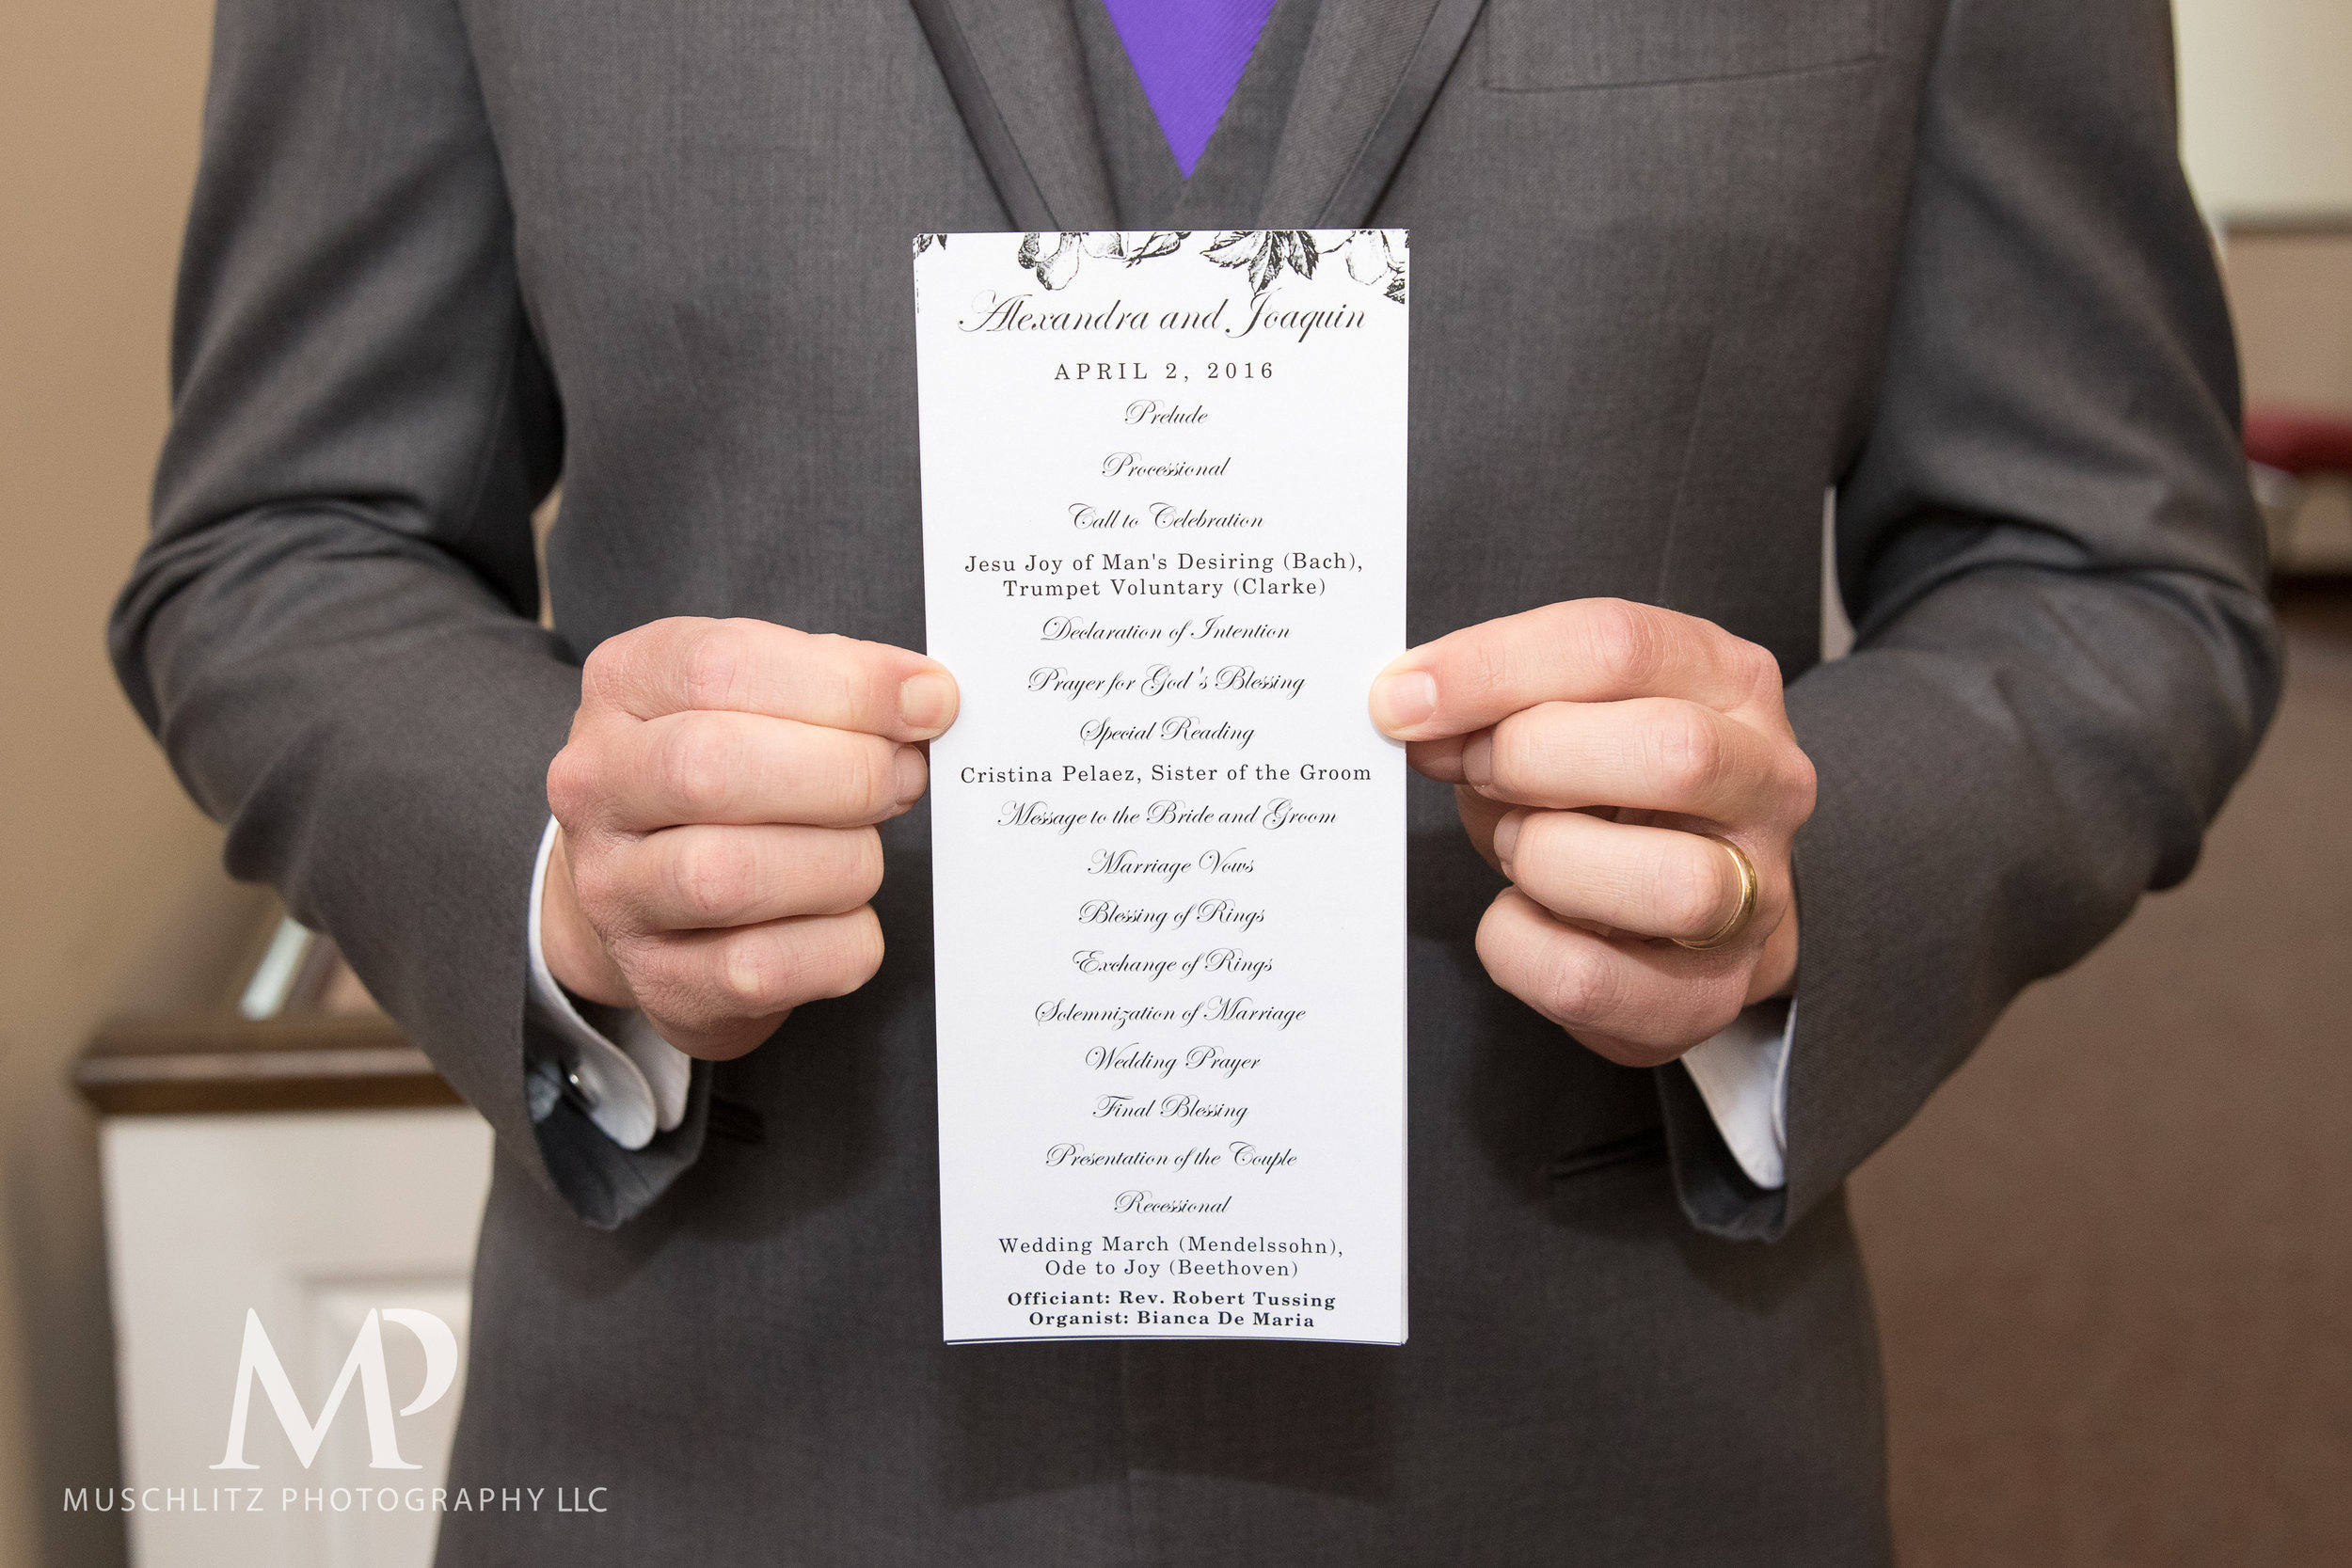 dublin-community-church-wedding-columbus-ohio-muschlitz-photography-027.JPG